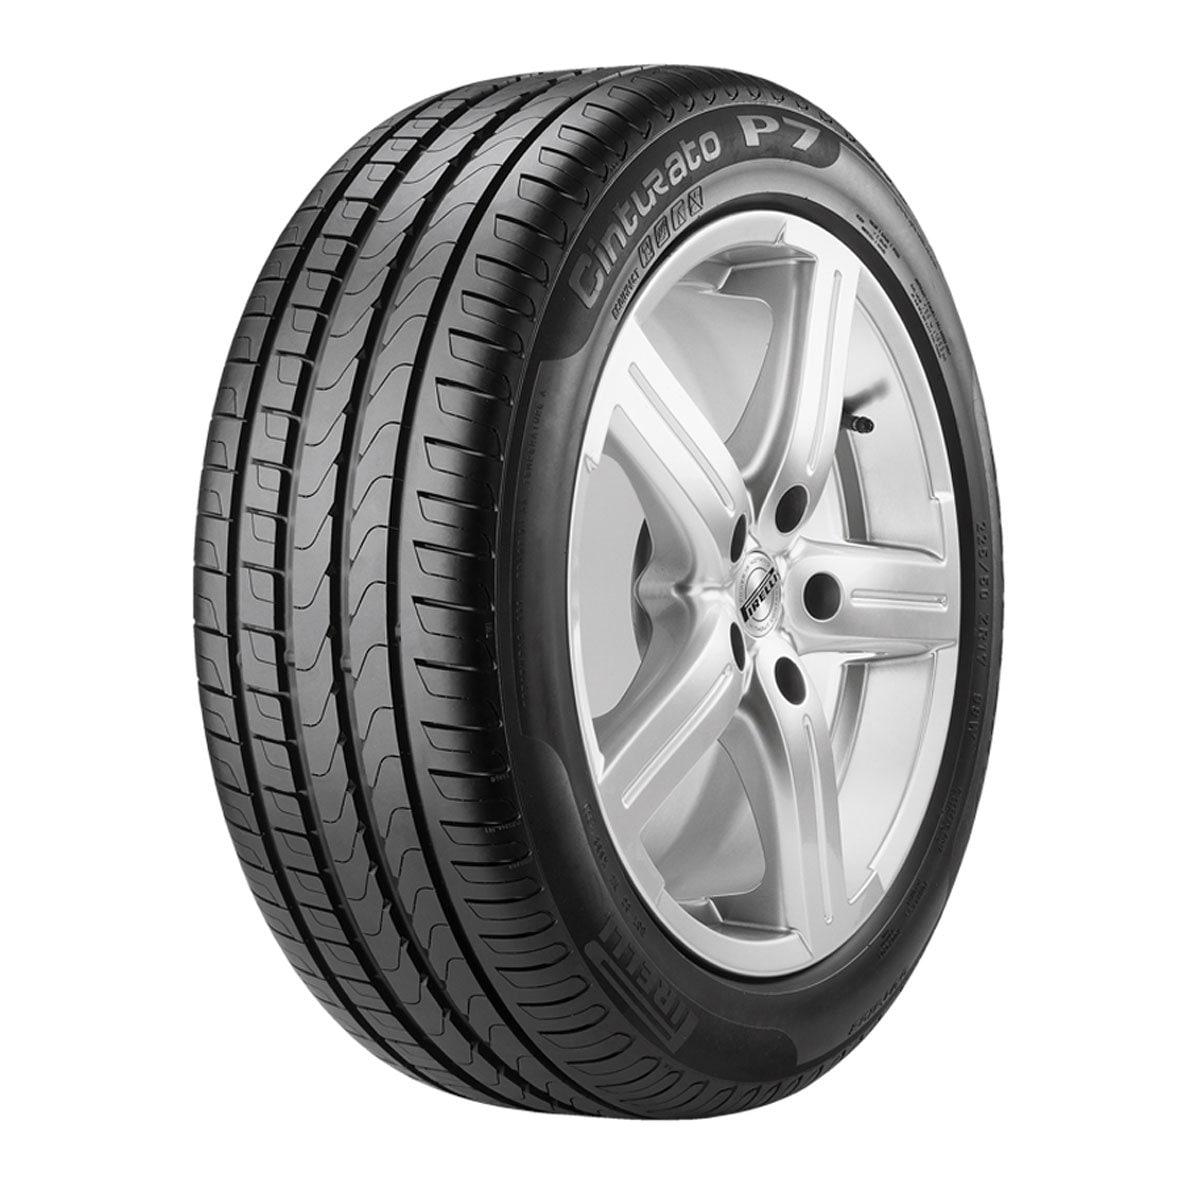 Spllanta 195 55 R16 P7 Cinturato 91V Pirelli